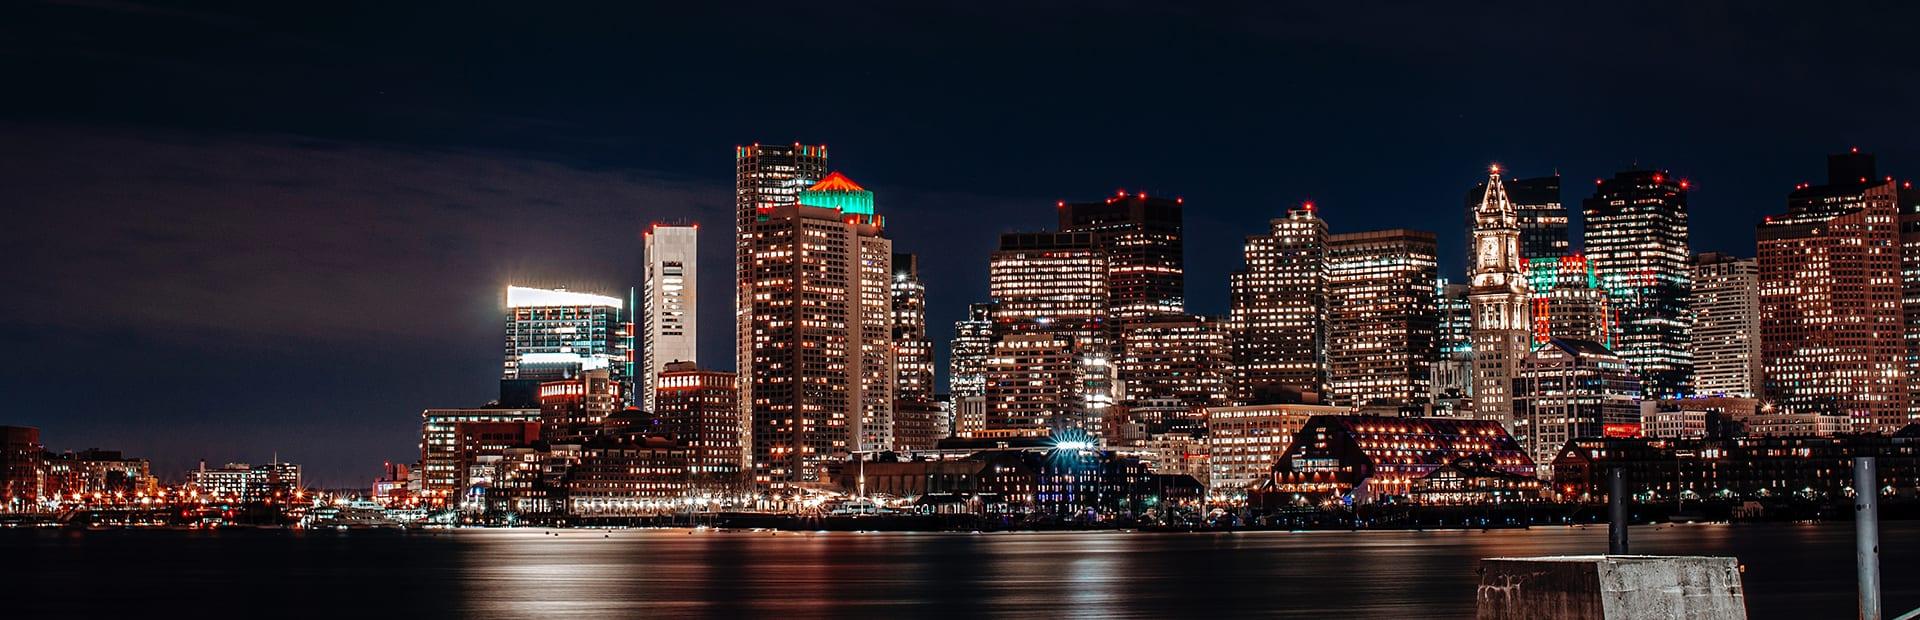 Photo of Boston skyline at night